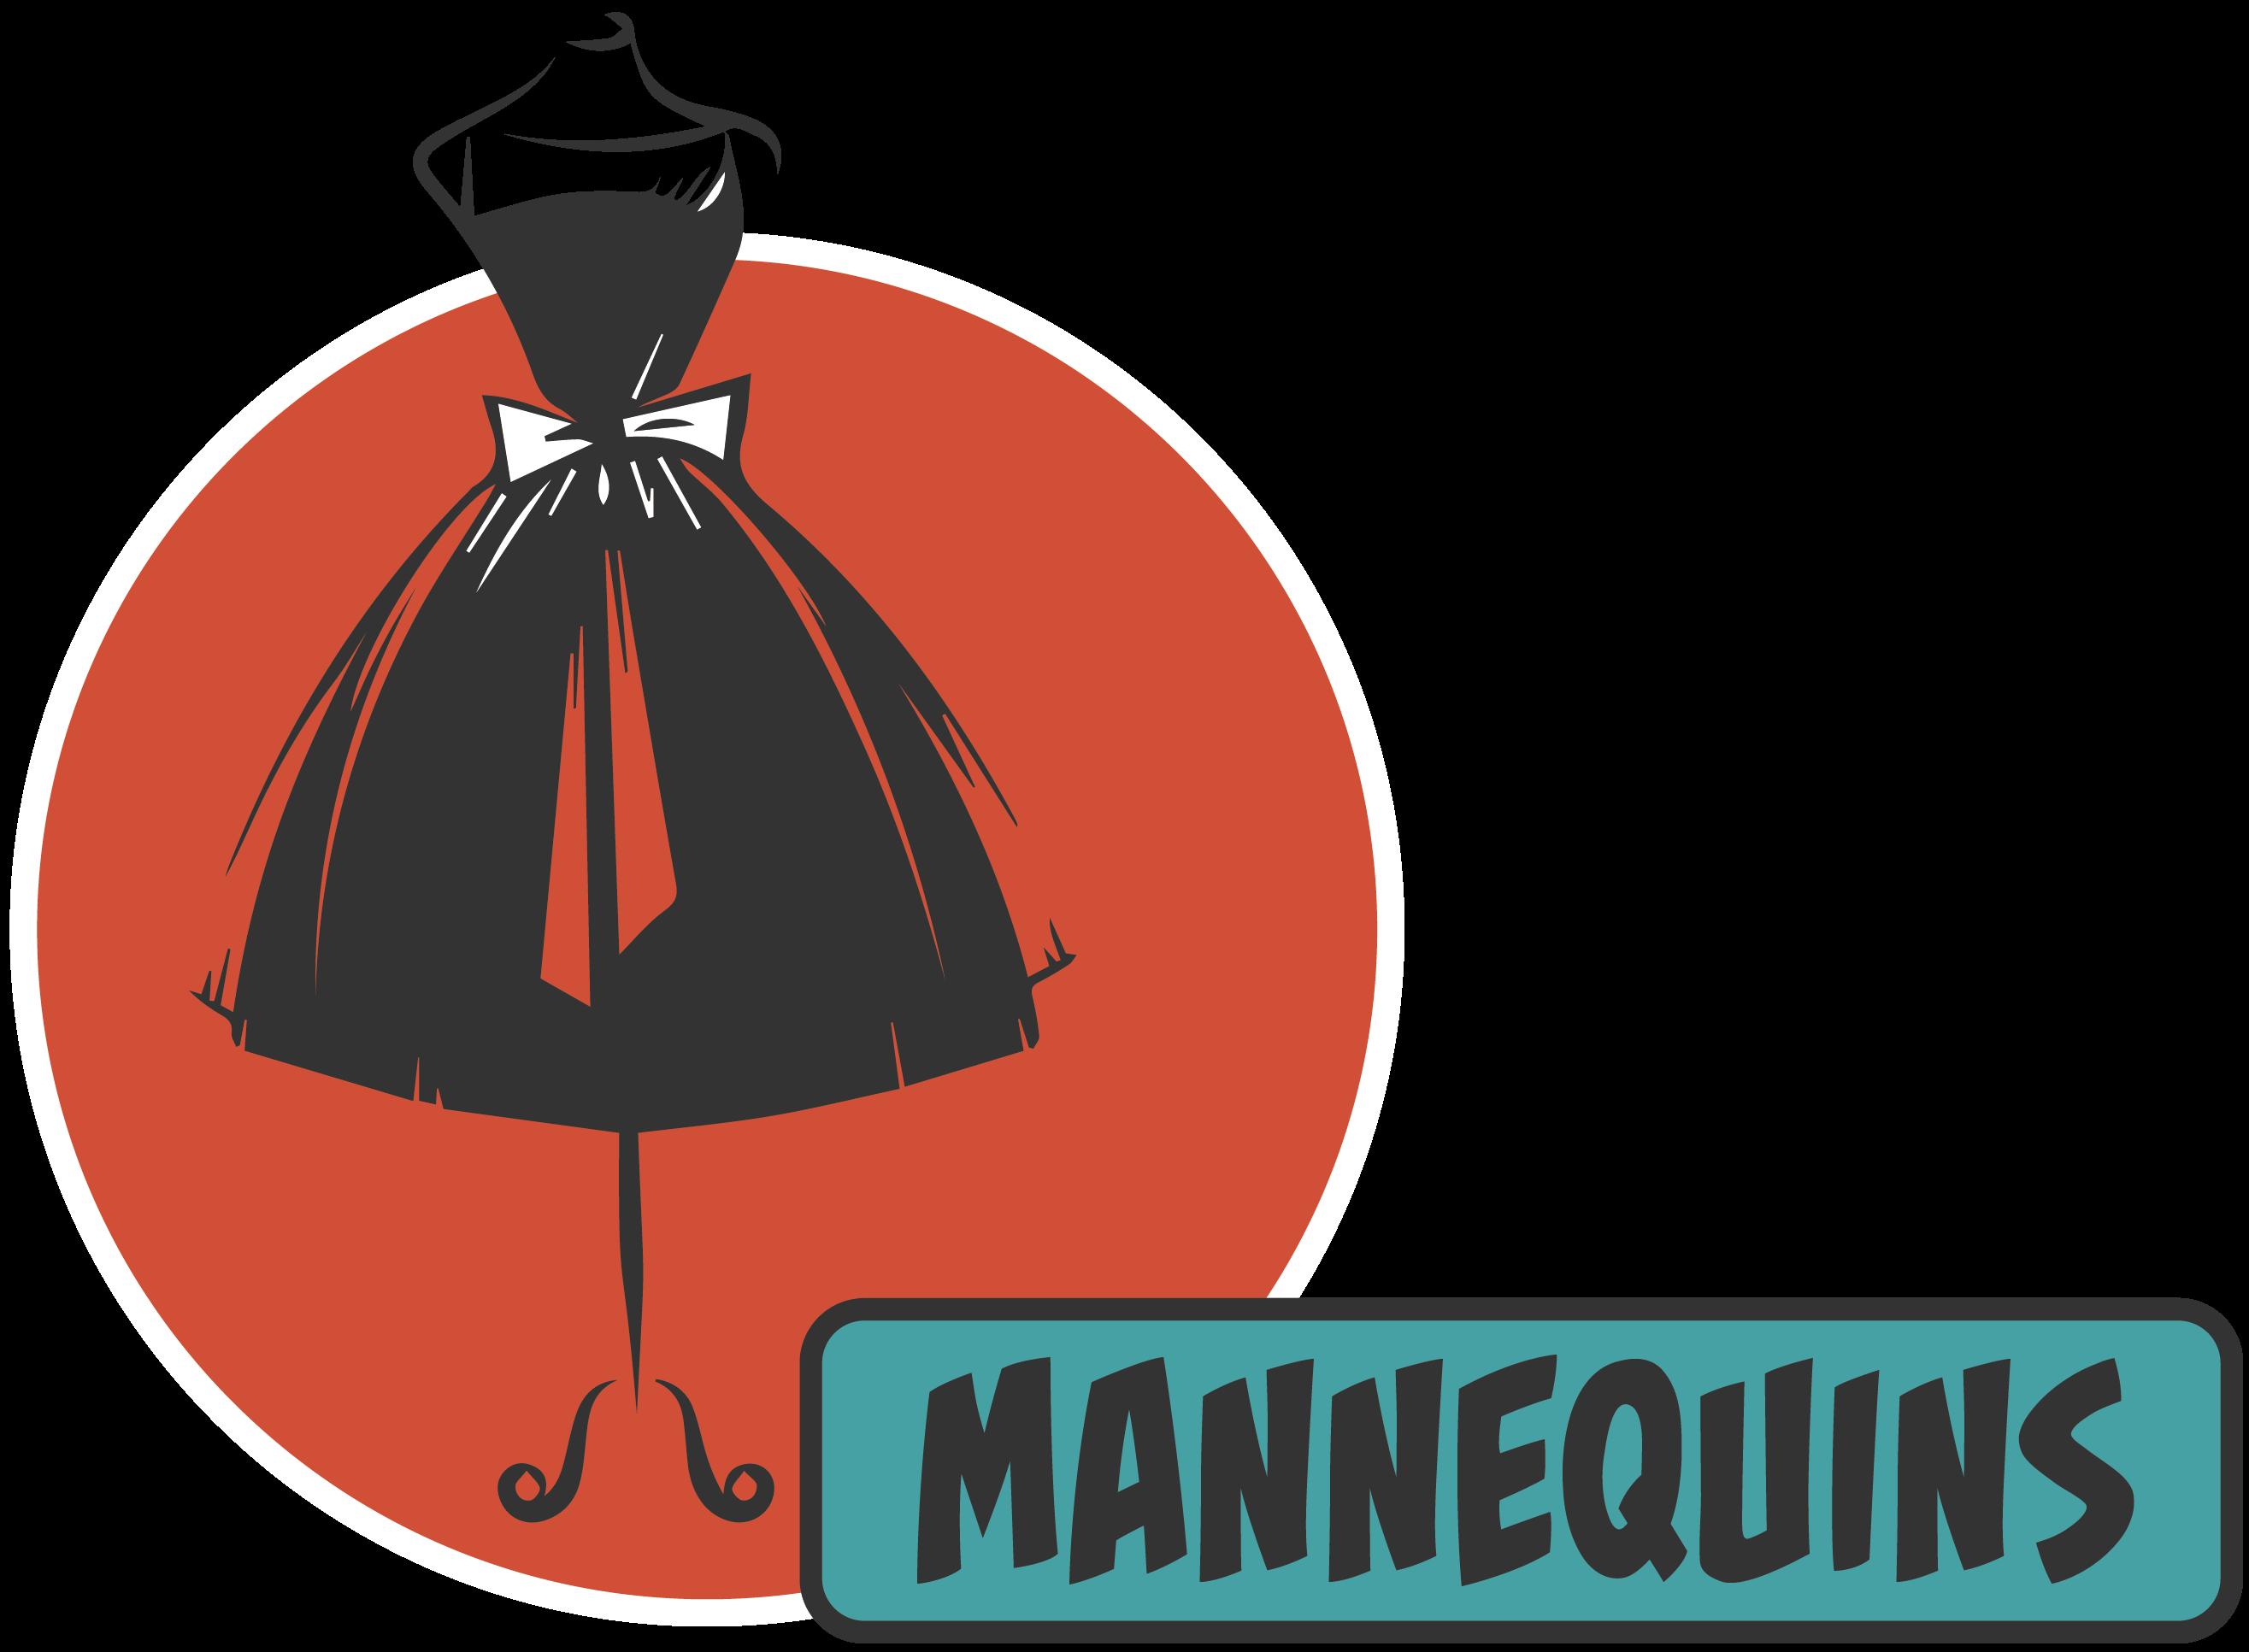 mannequins-01